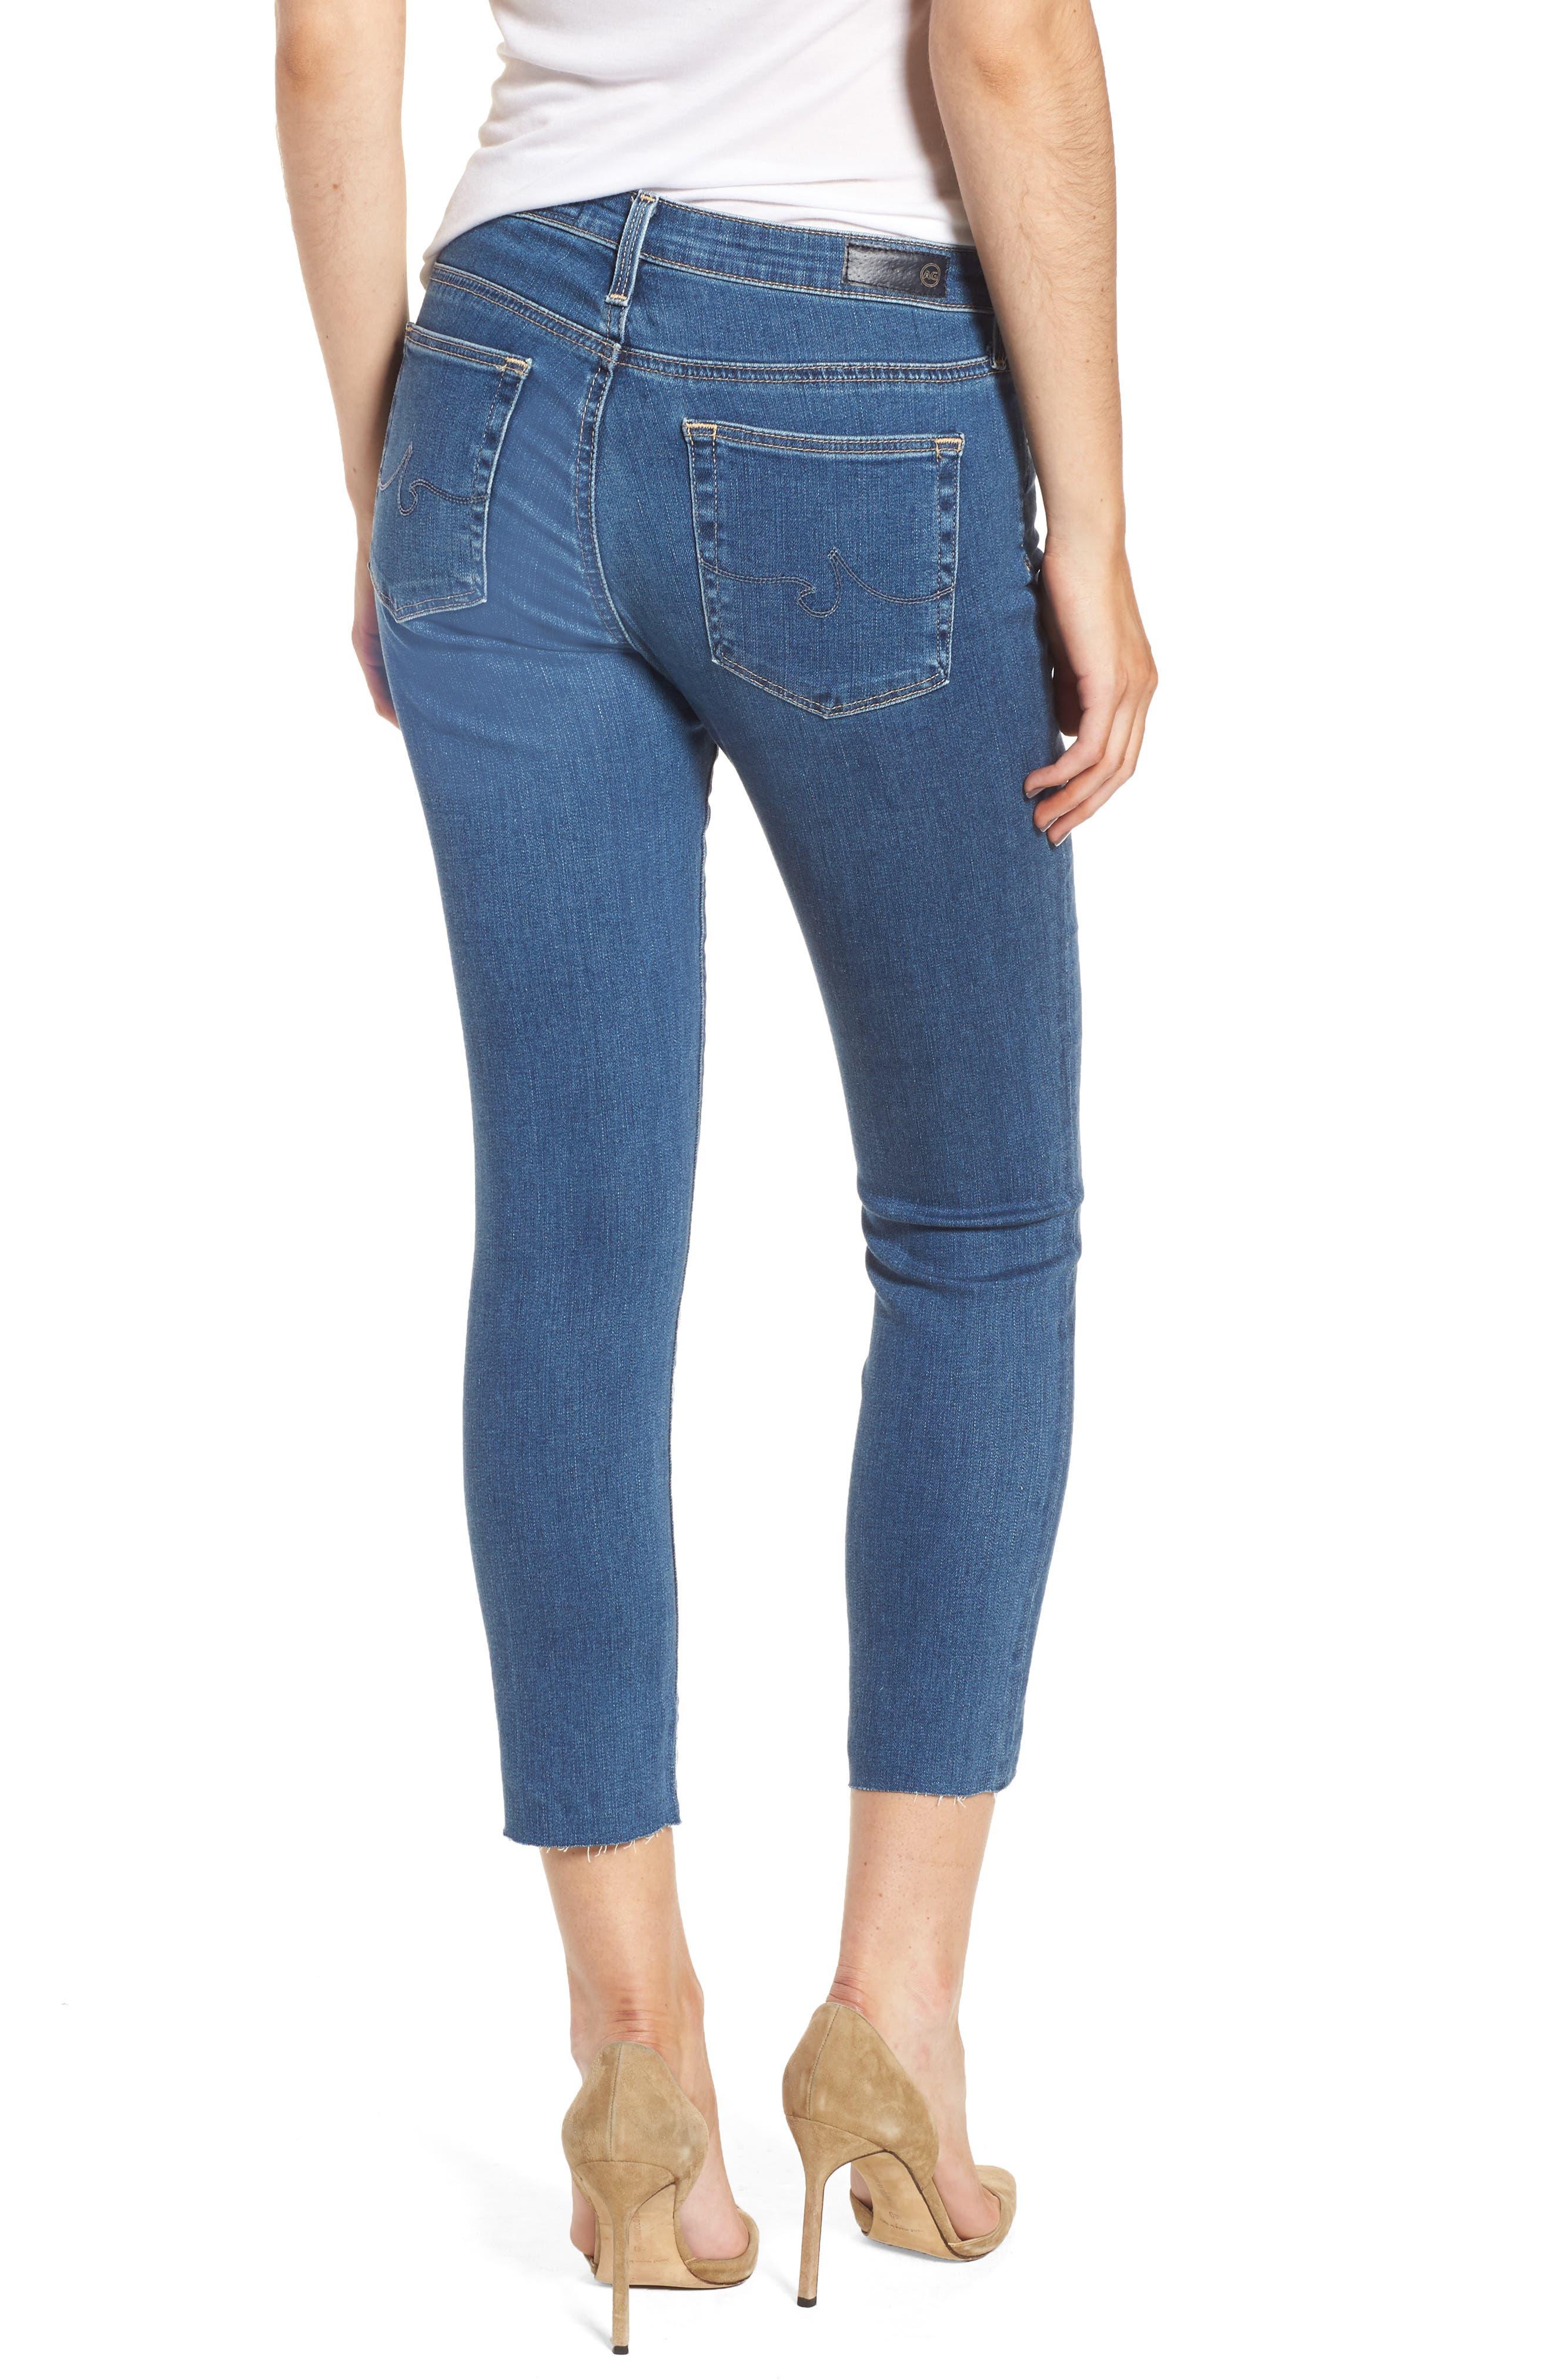 Prima Crop Skinny Jeans,                             Alternate thumbnail 2, color,                             Indigo Viking